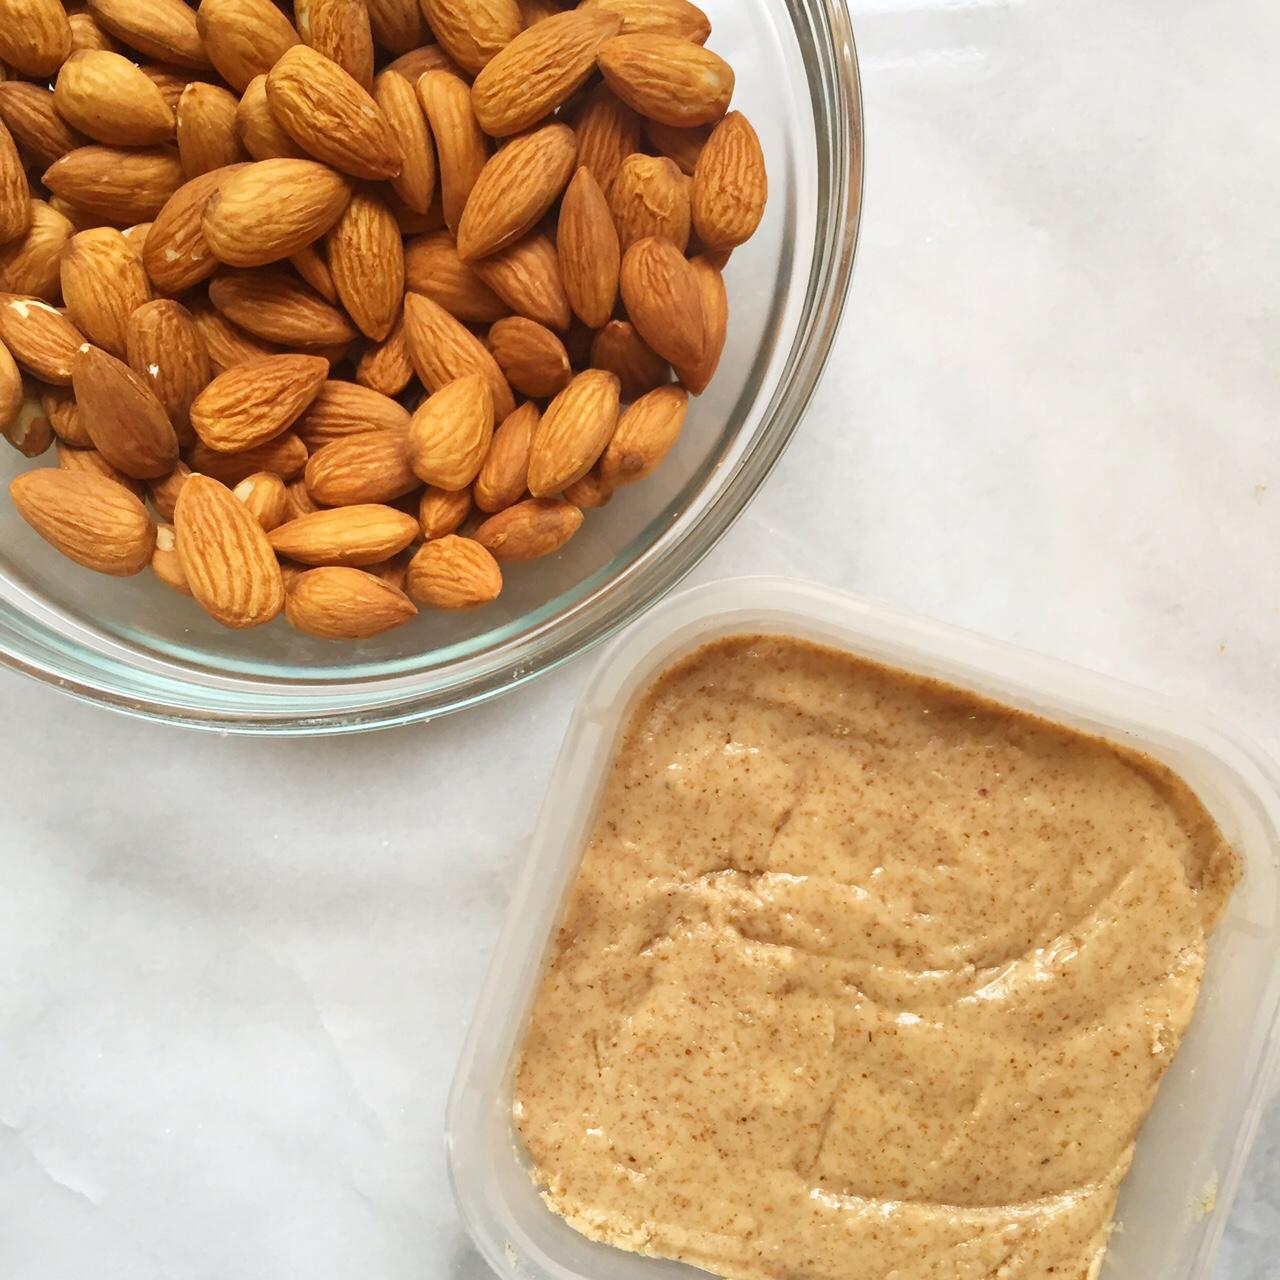 Homemade Almond Butter | Four Threads www.thefourthreads.com